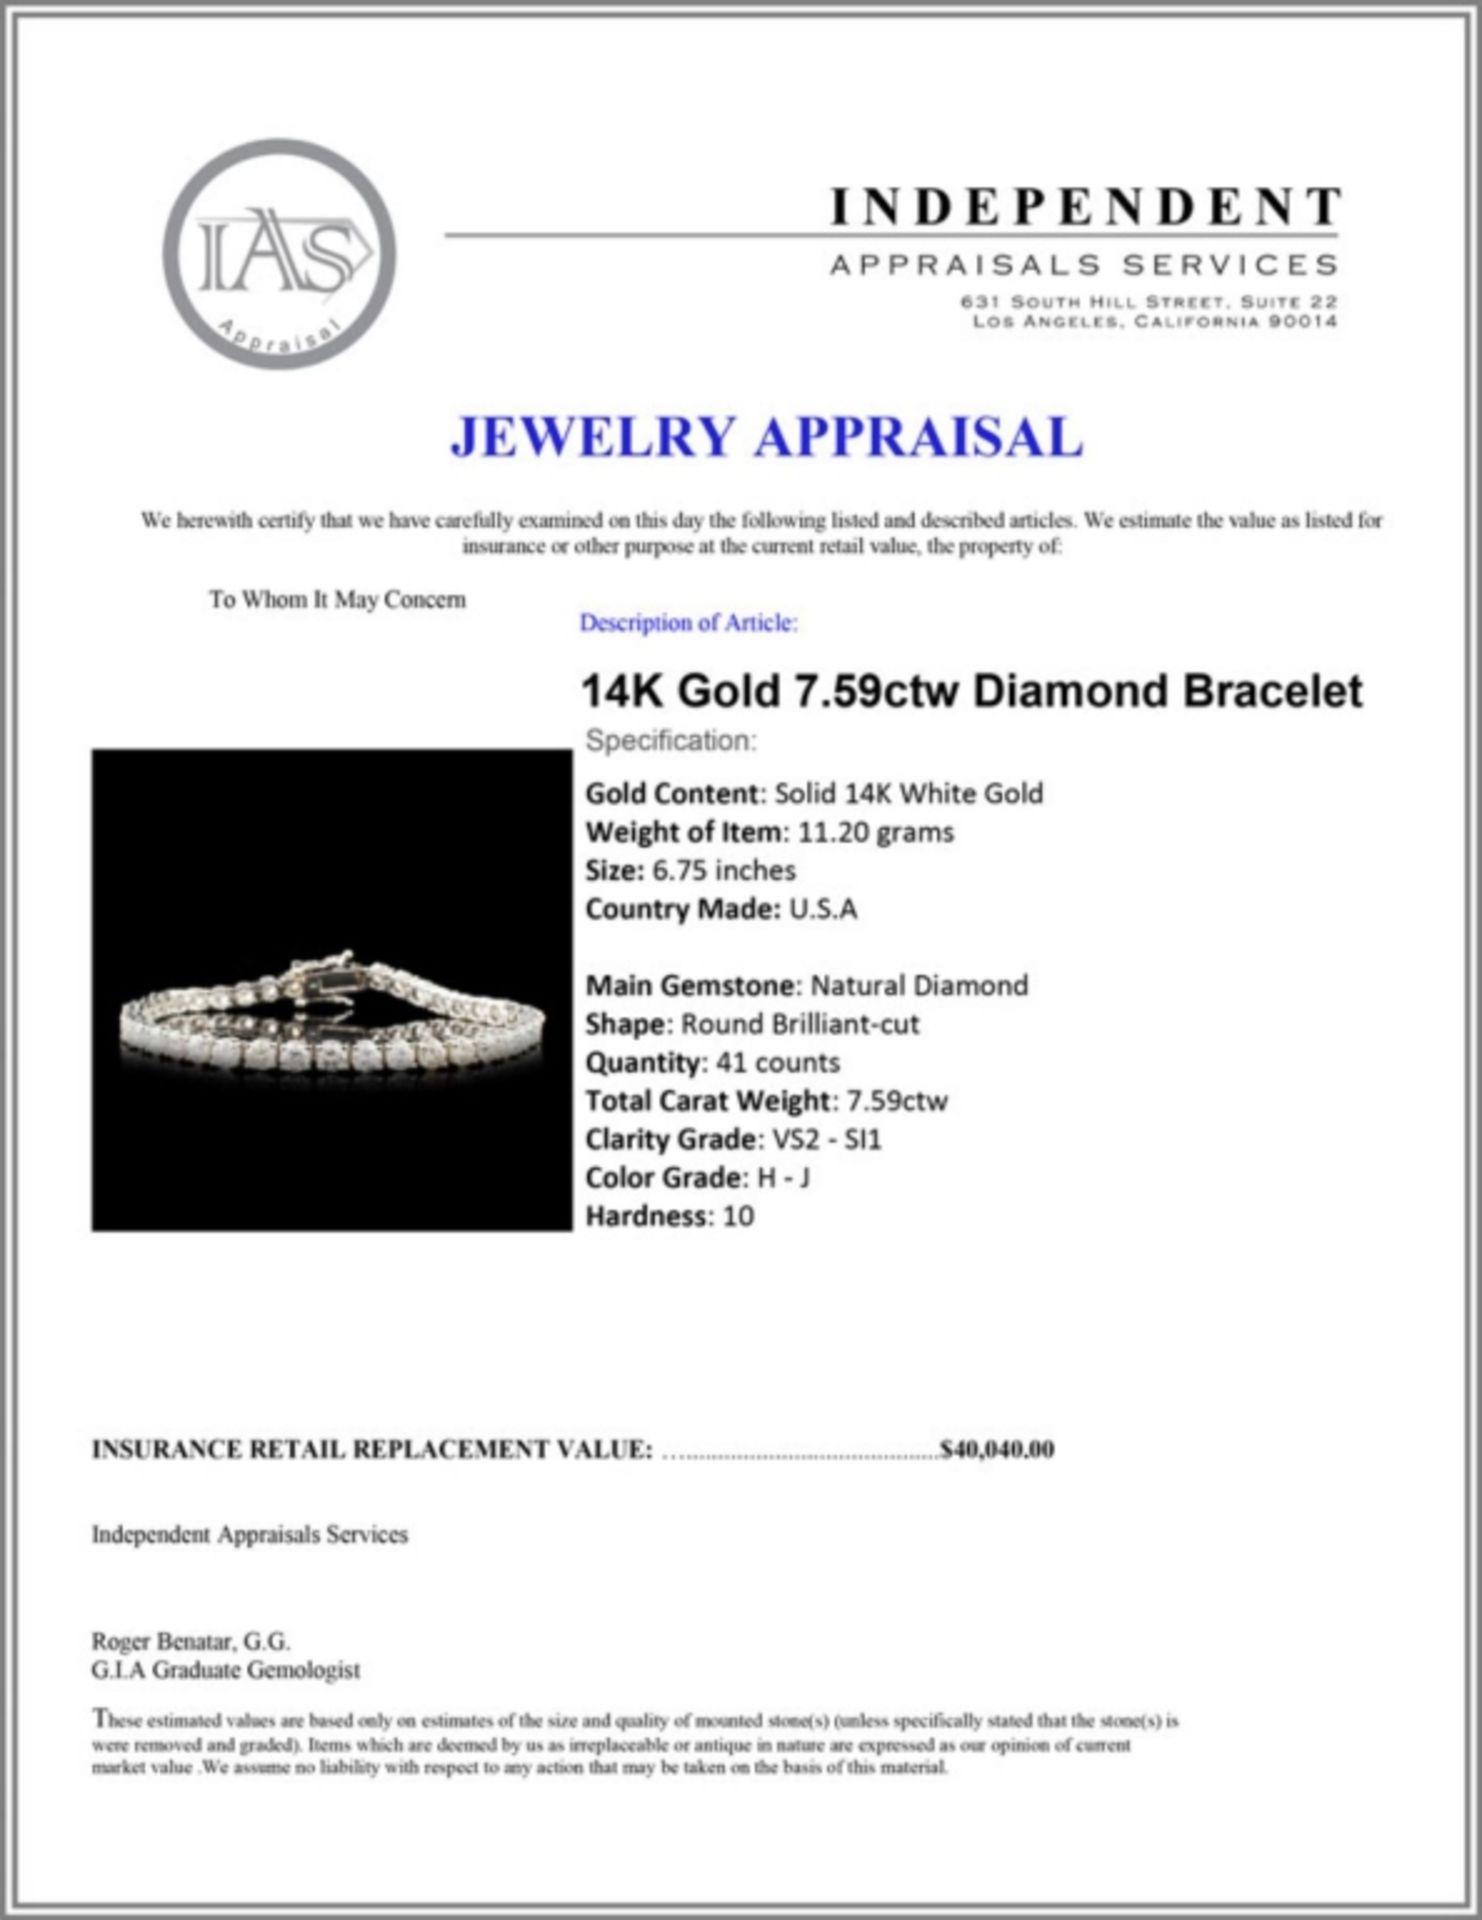 14K Gold 7.59ctw Diamond Bracelet - Image 4 of 4